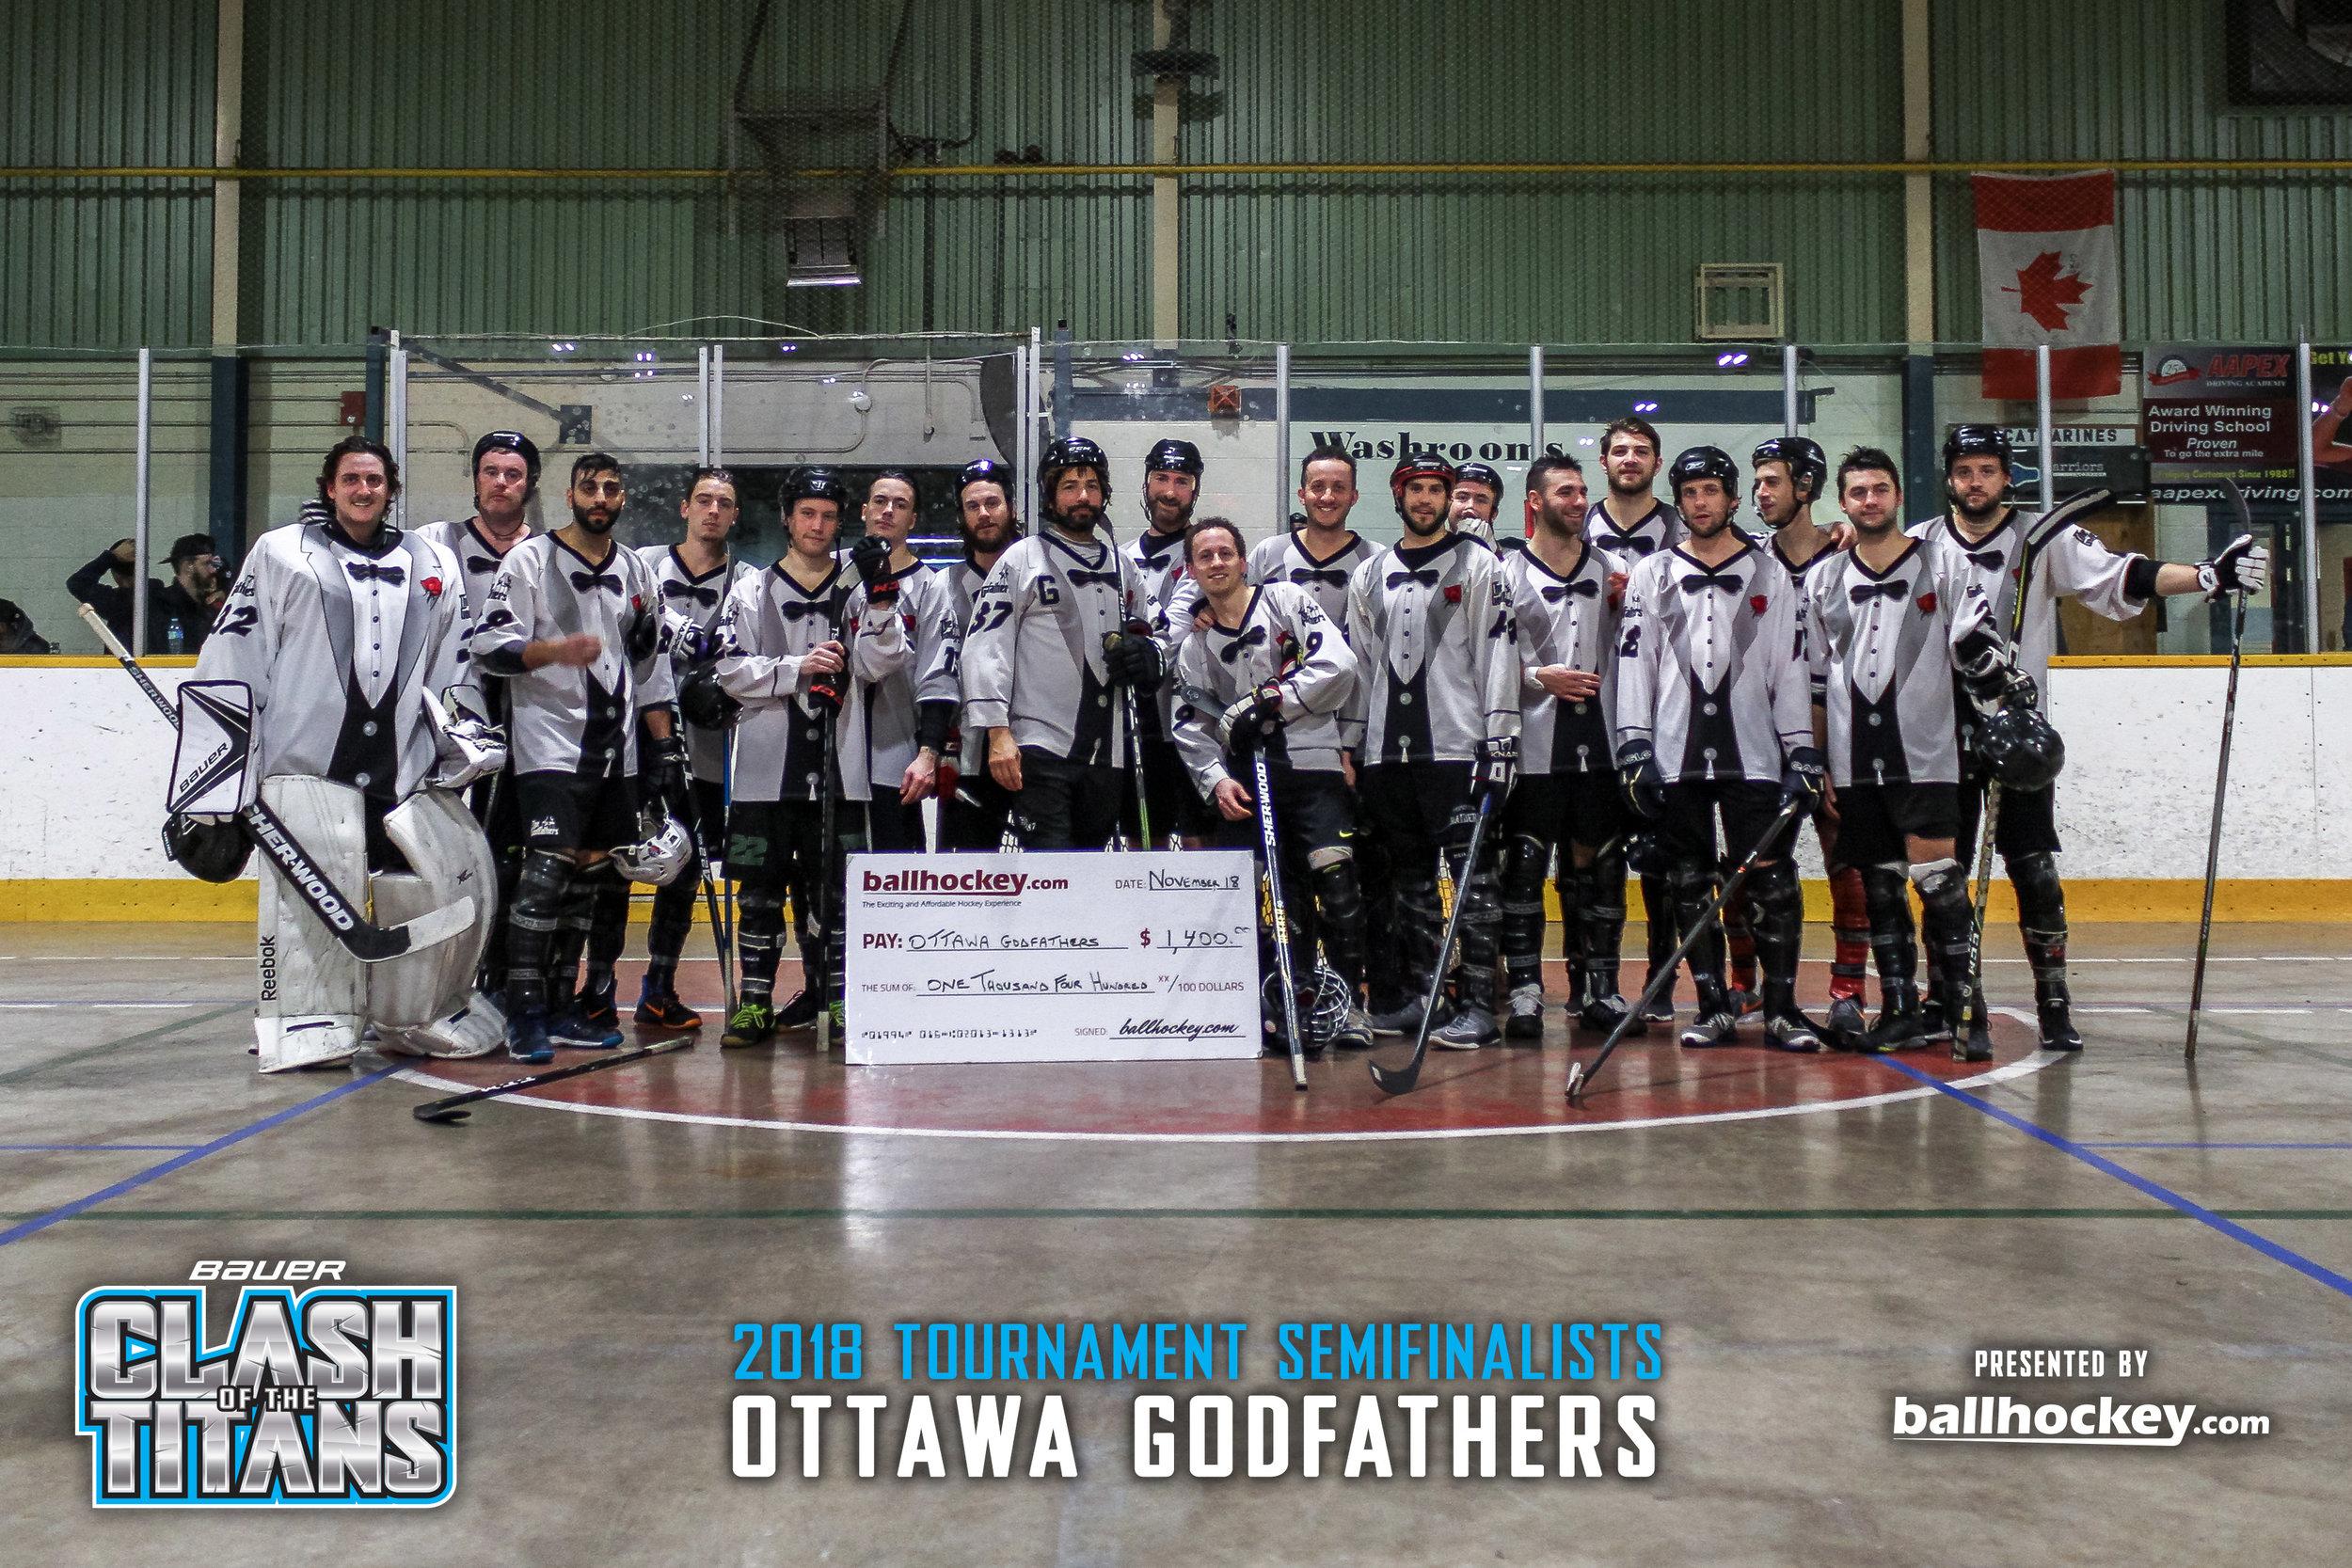 2018 Bauer Clash of the Titans Semifinalist - Ottawa Godfathers